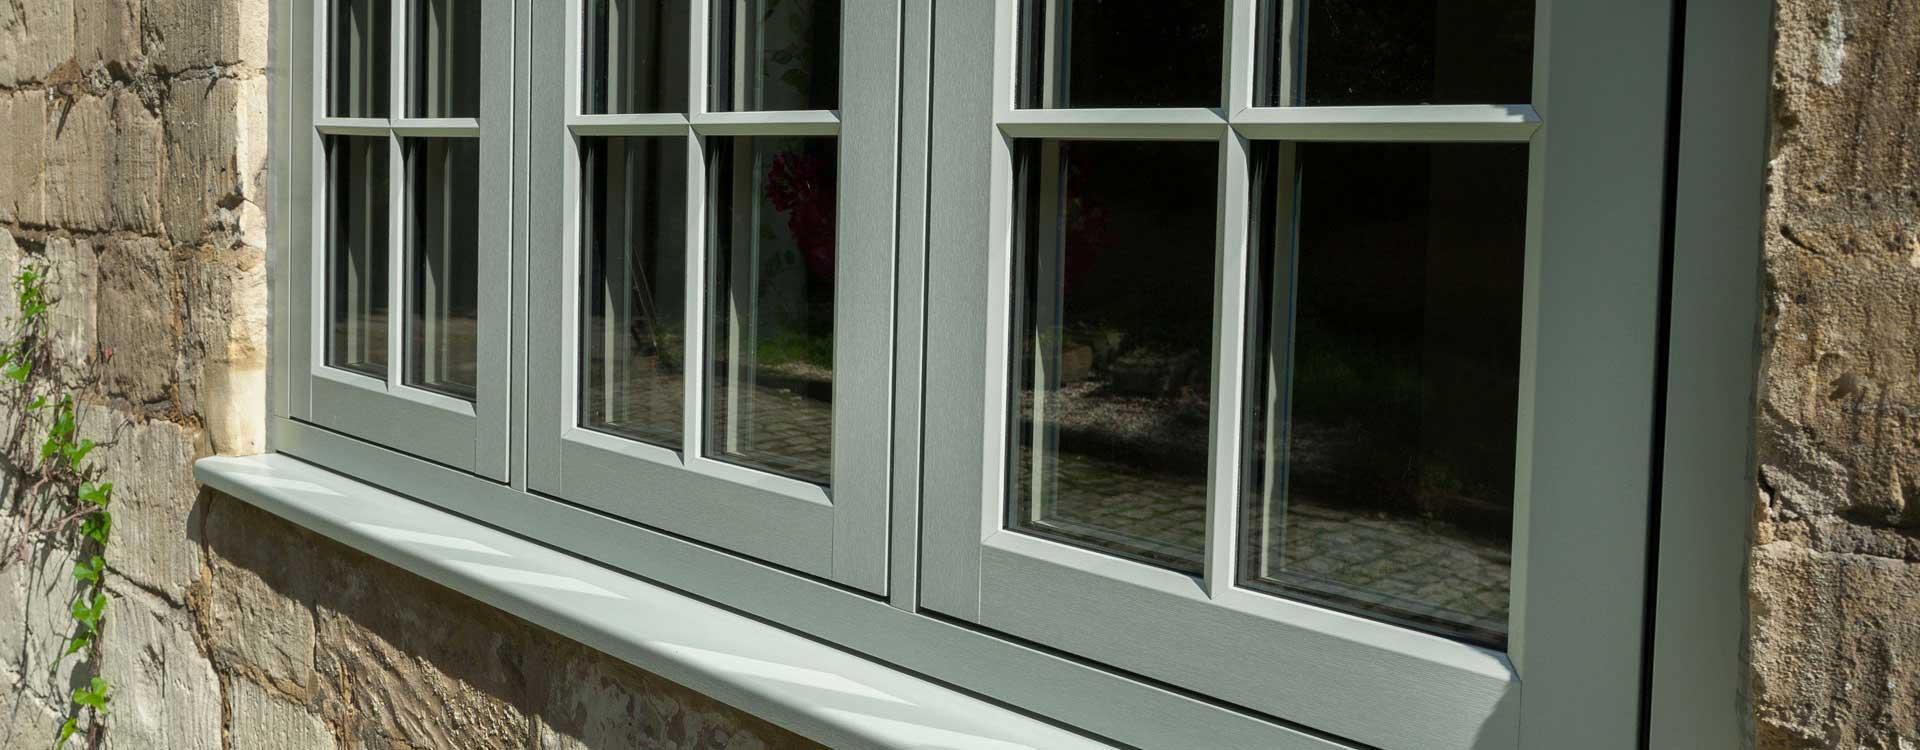 R9 Double Glazed Windows Leominster